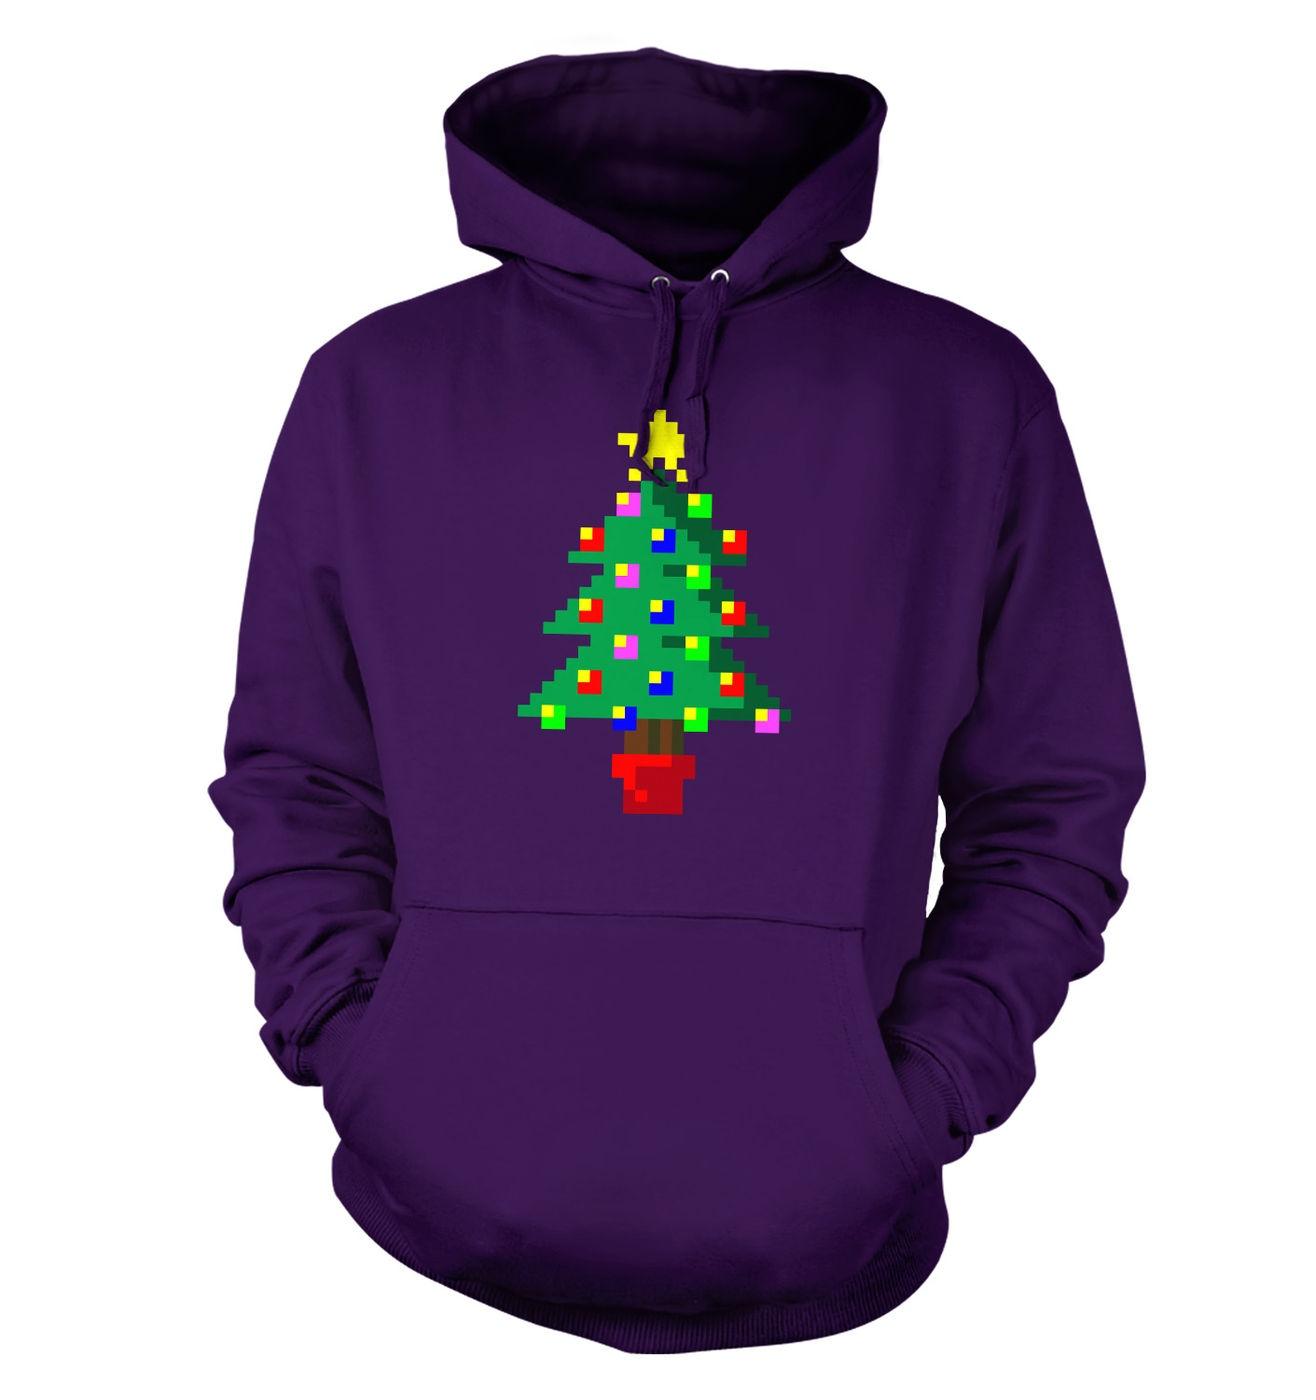 Pixellated Christmas Tree hoodie